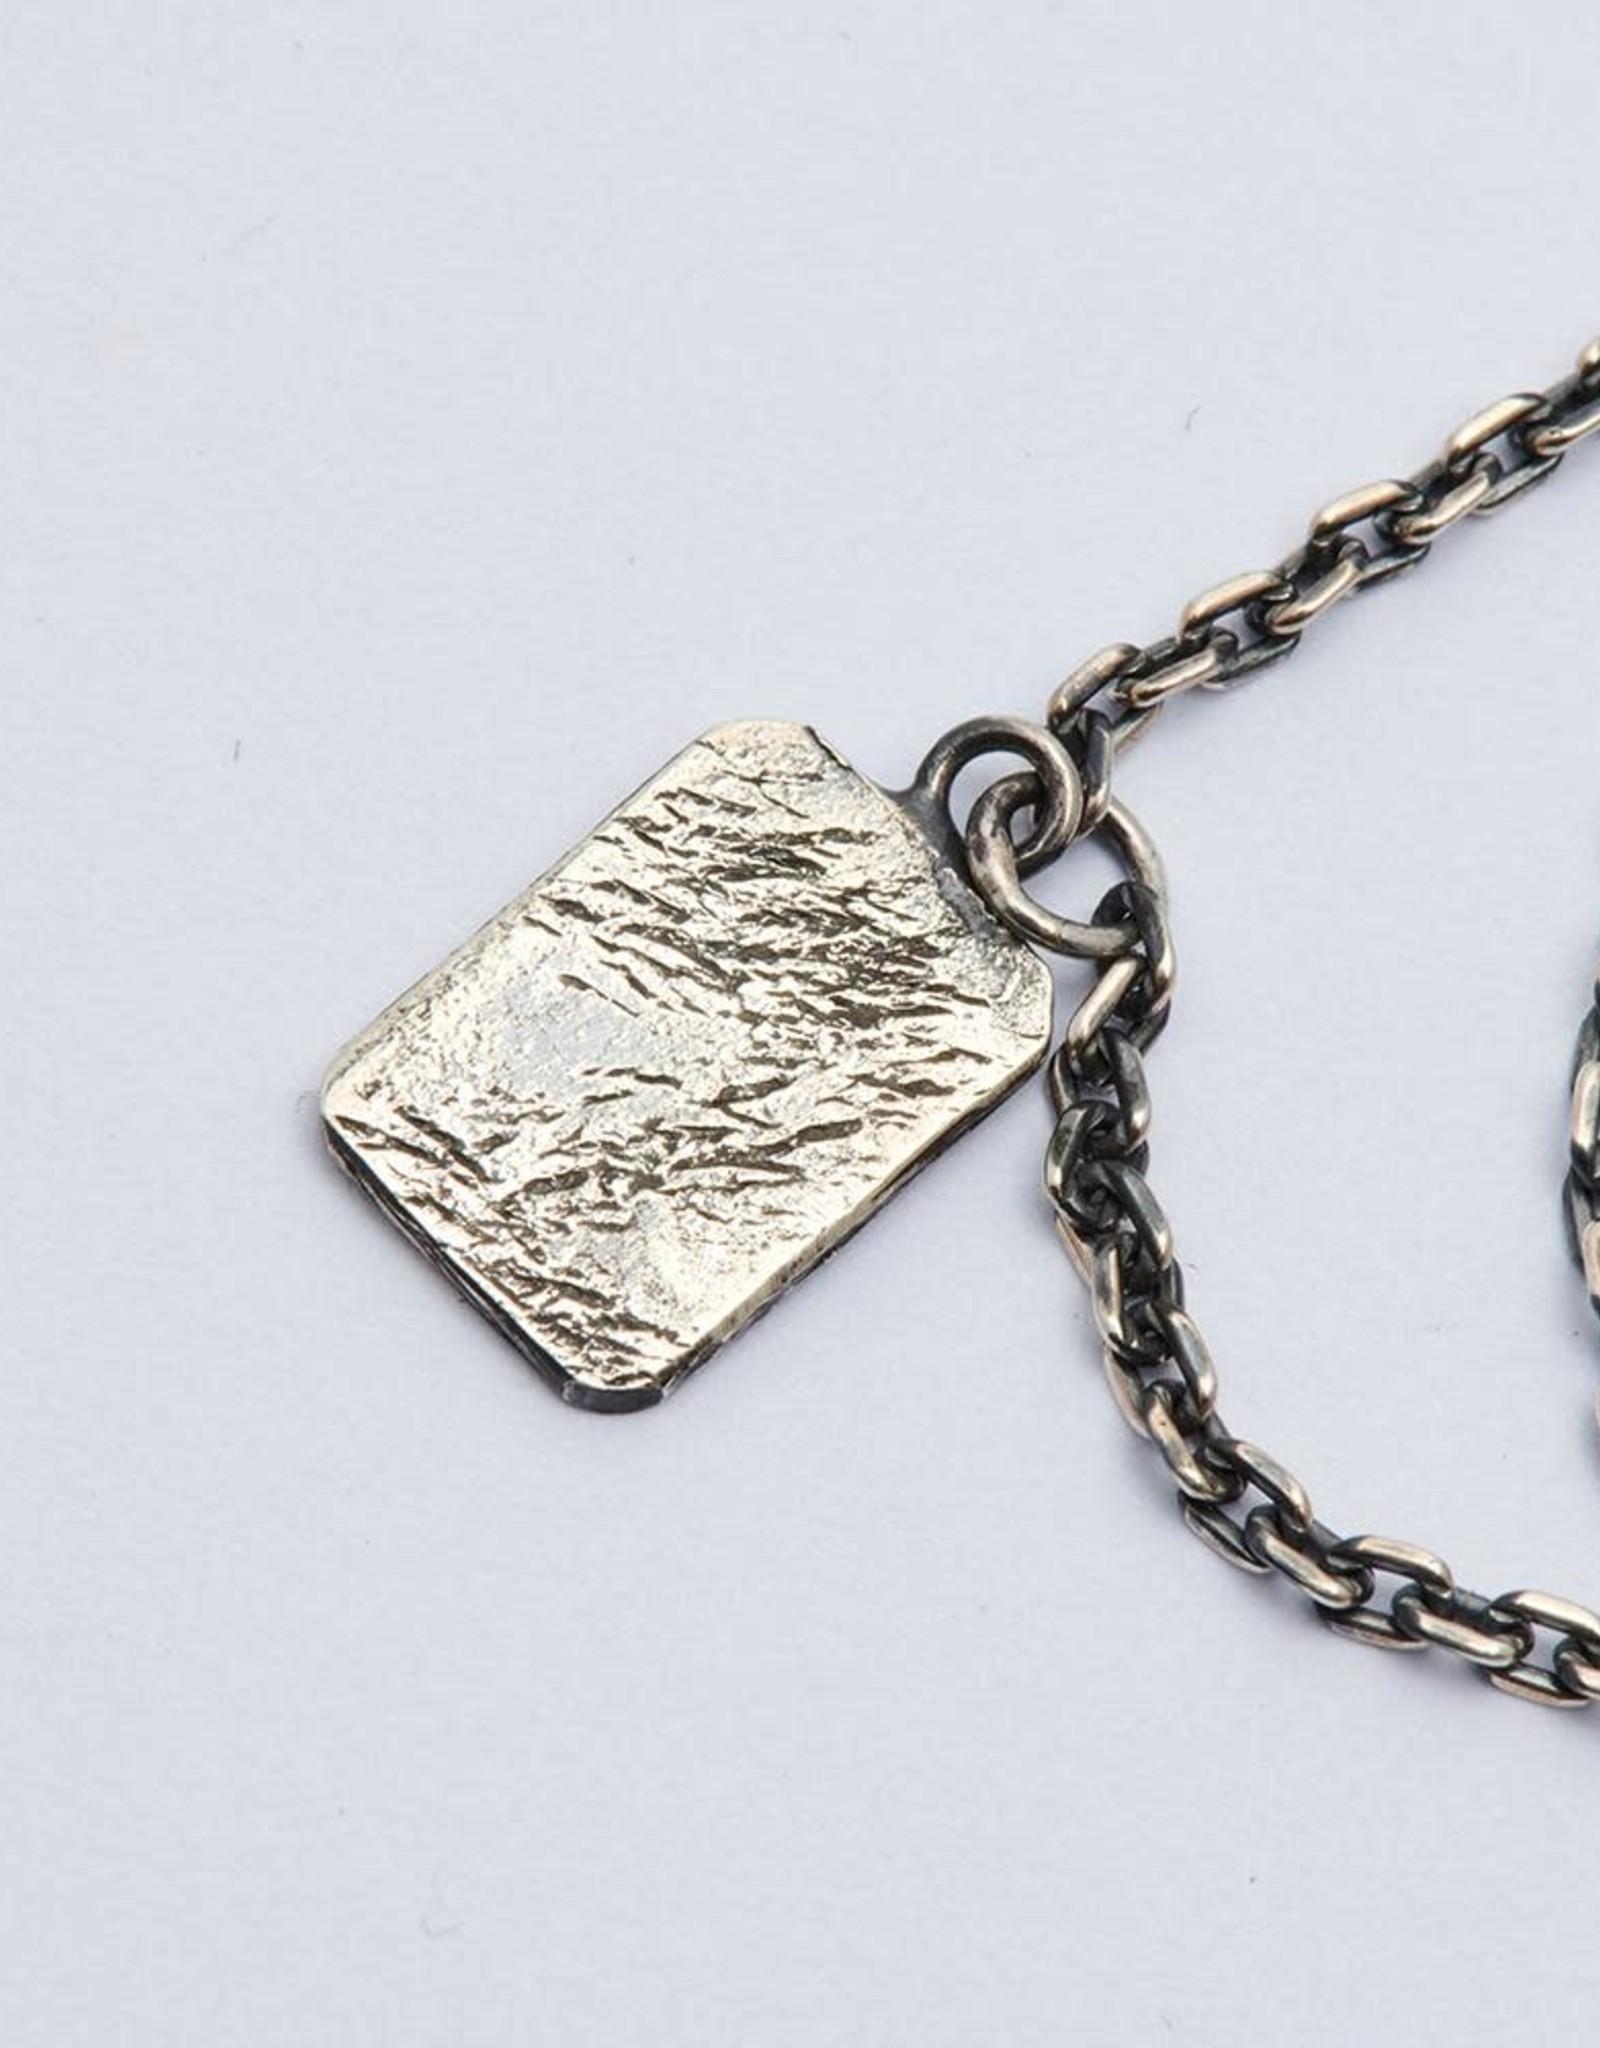 Buck Palmer Rustic Tag Necklace